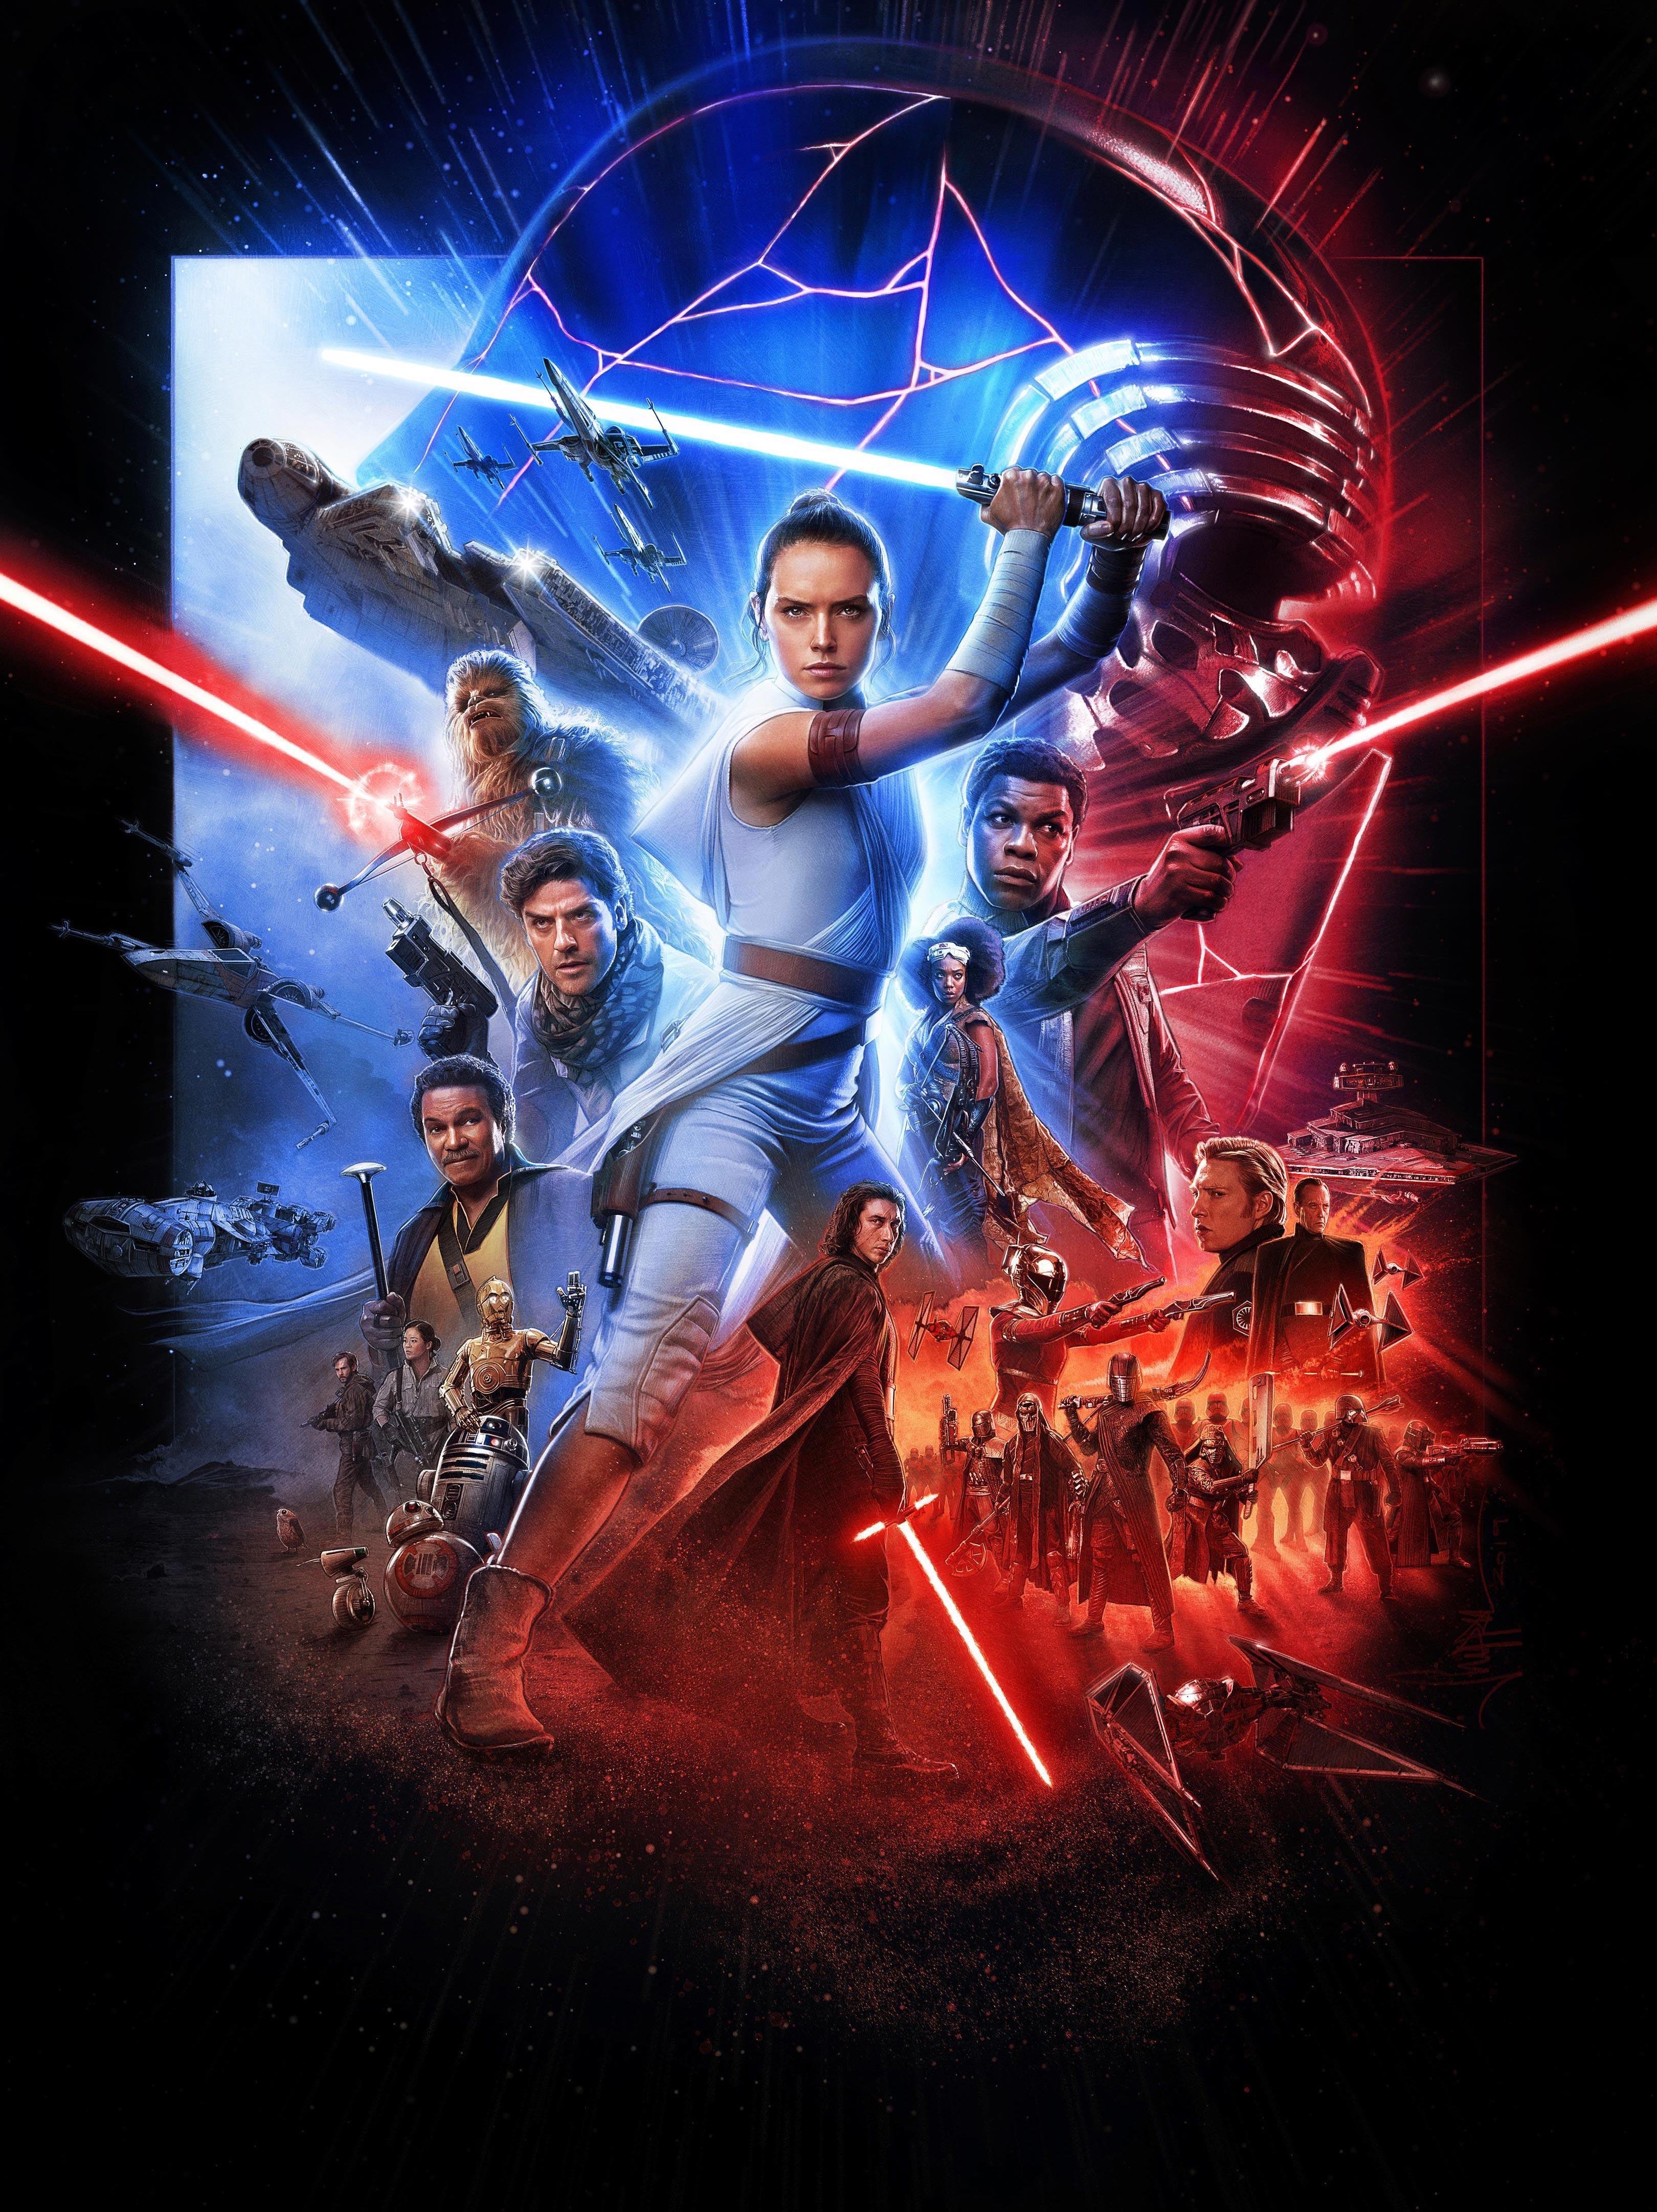 Star Wars The Rise Of Skywalker Paul Shipper International Poster Uhr Geek Carl